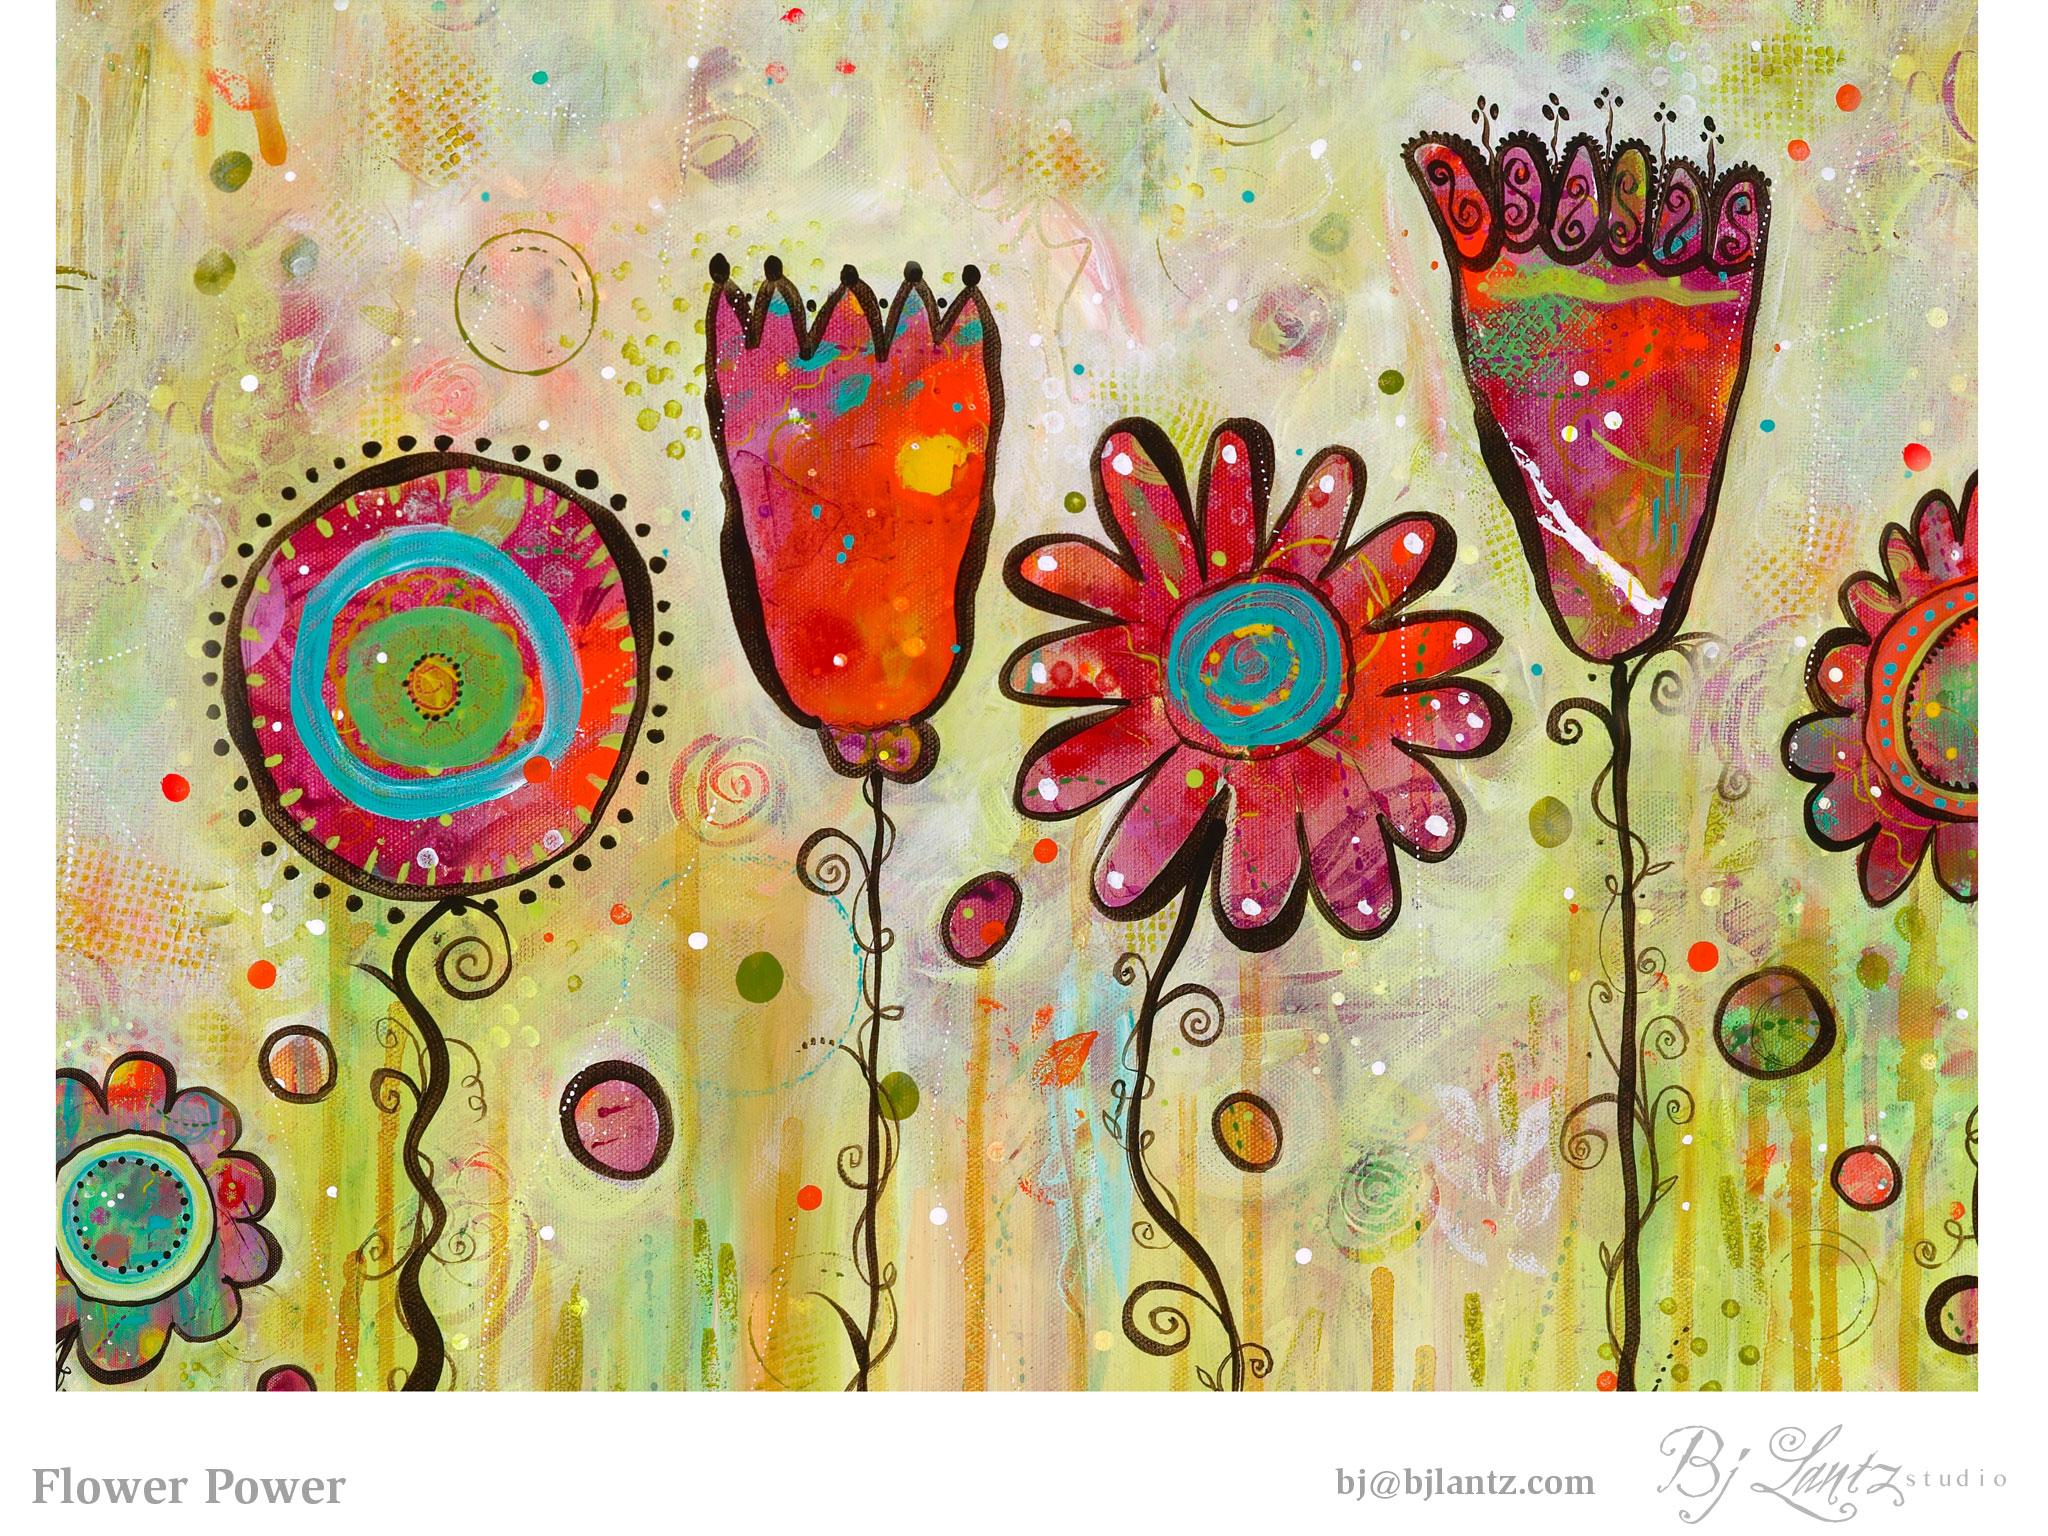 FlowerPower_BJLantz_15.jpg